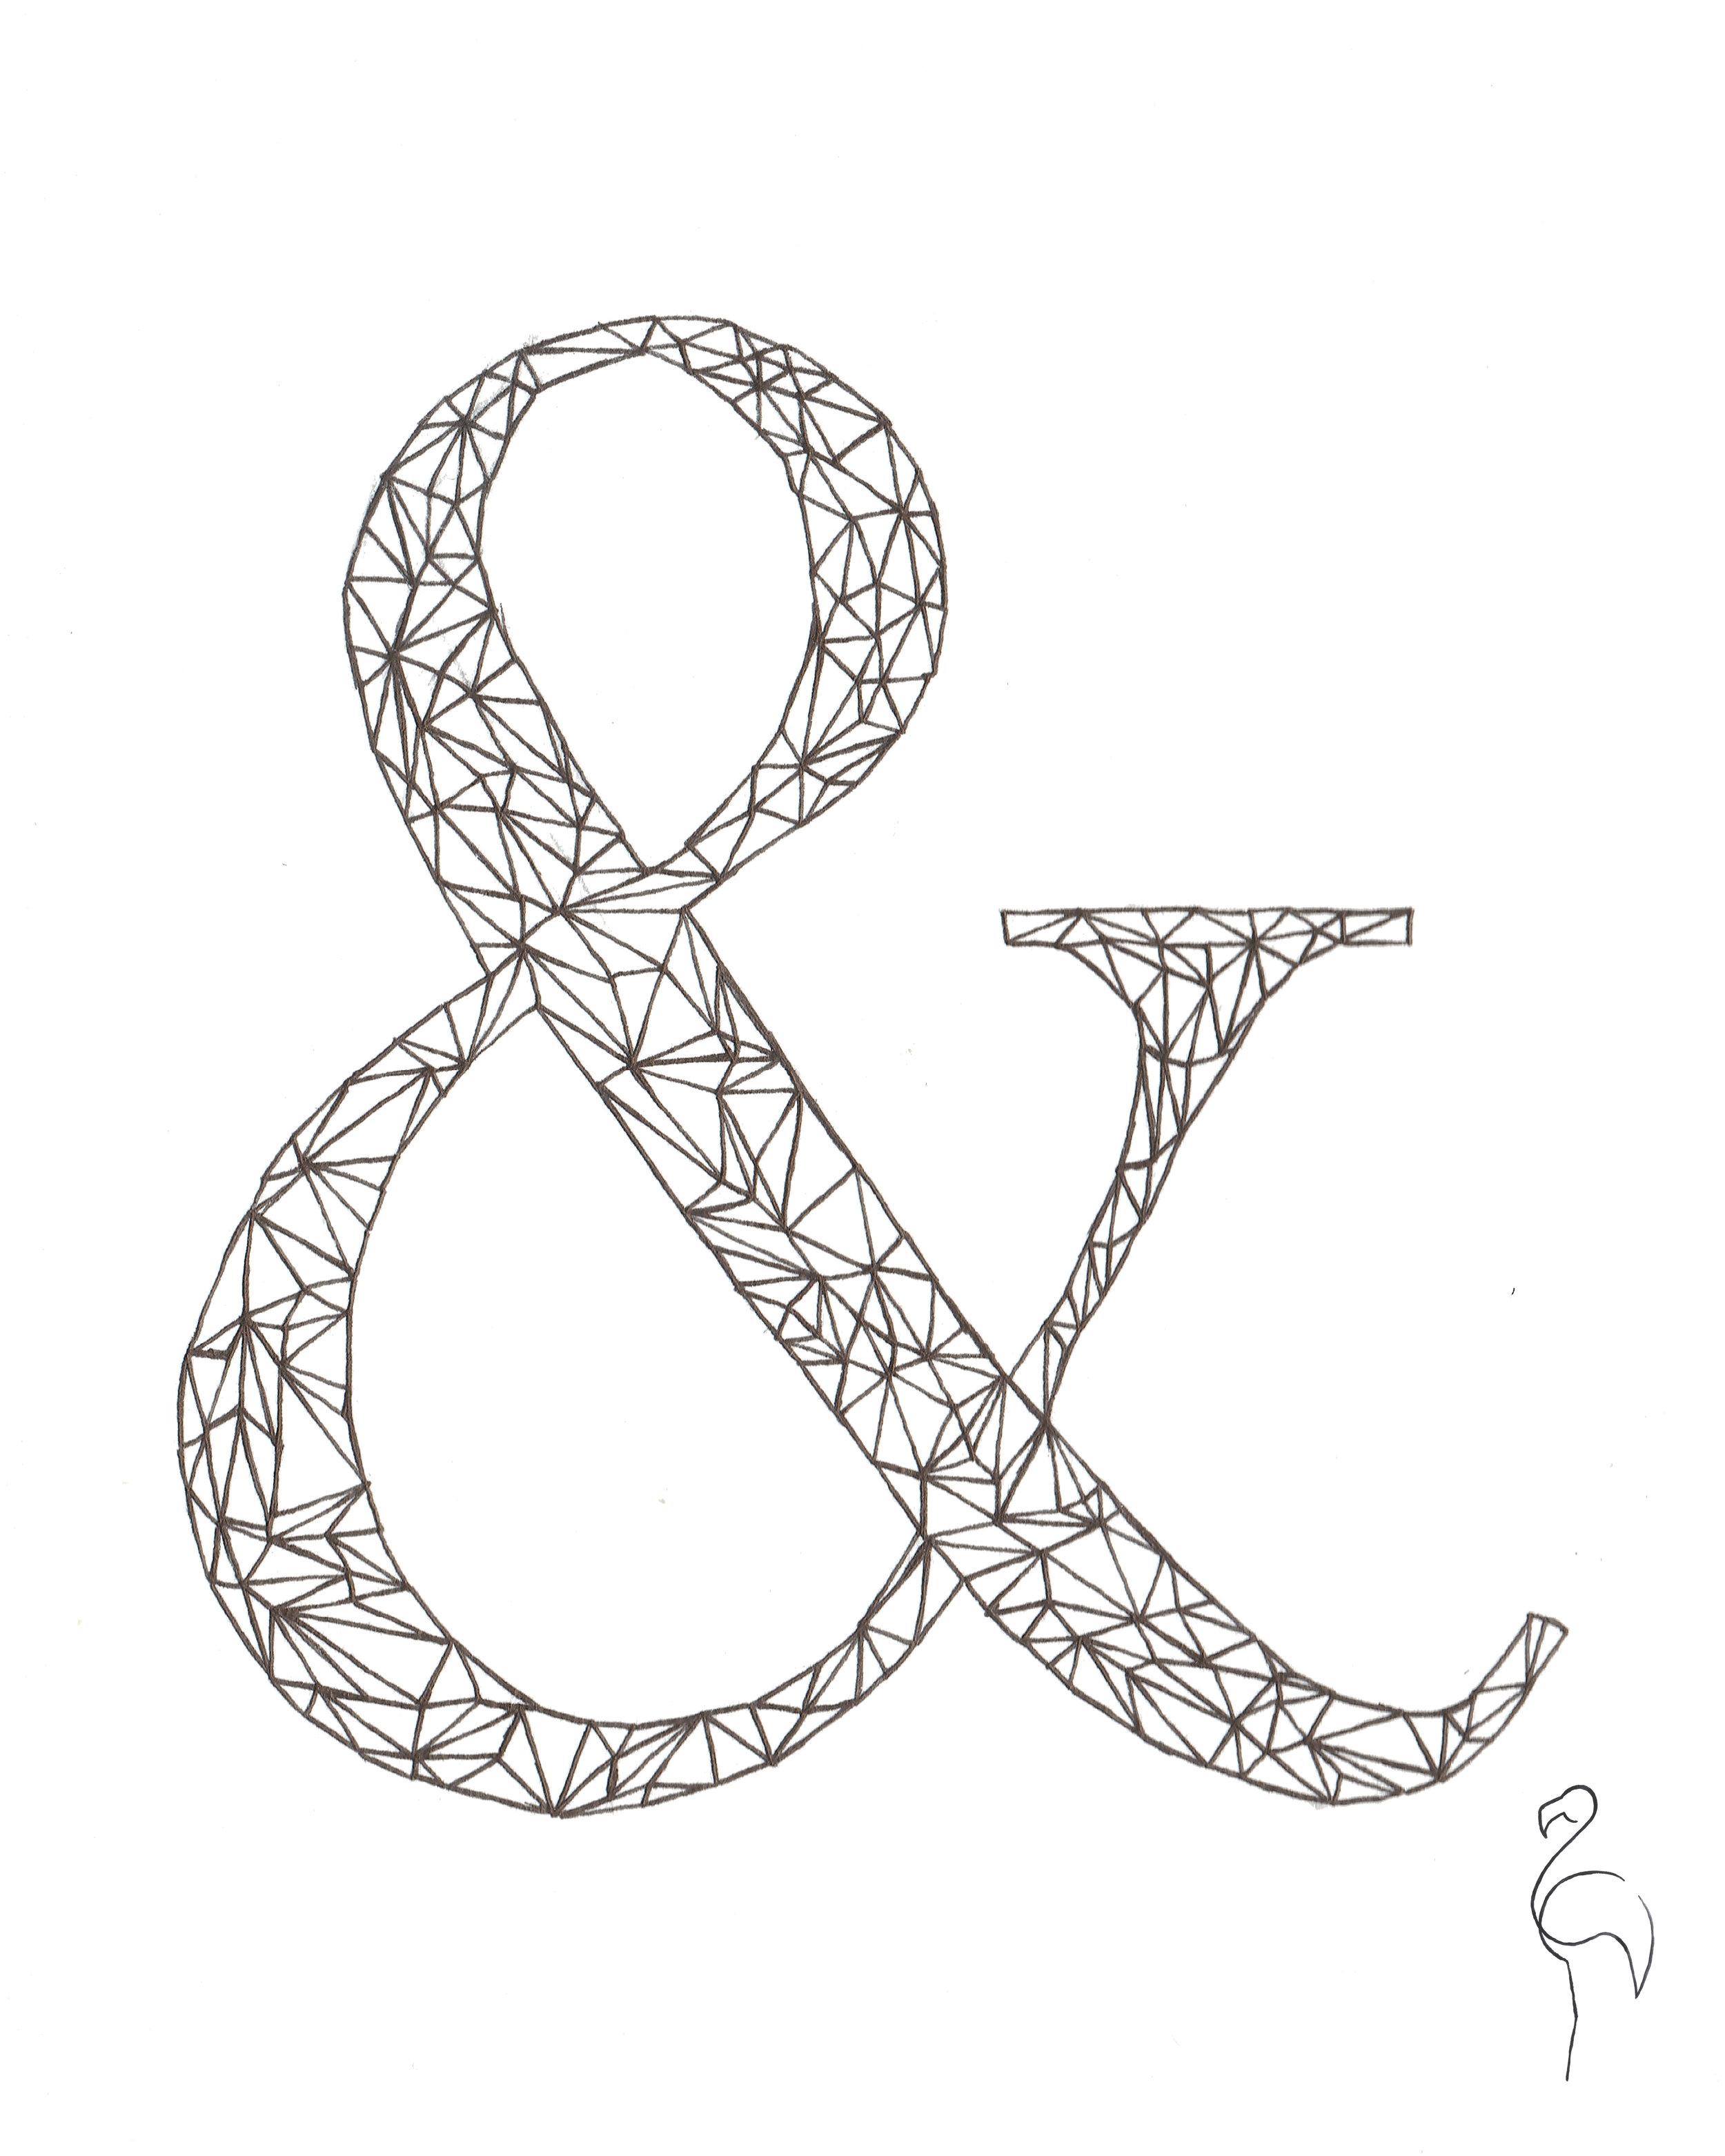 Brazzlebird - Ampersand Drawing Geometric Shapes.jpg